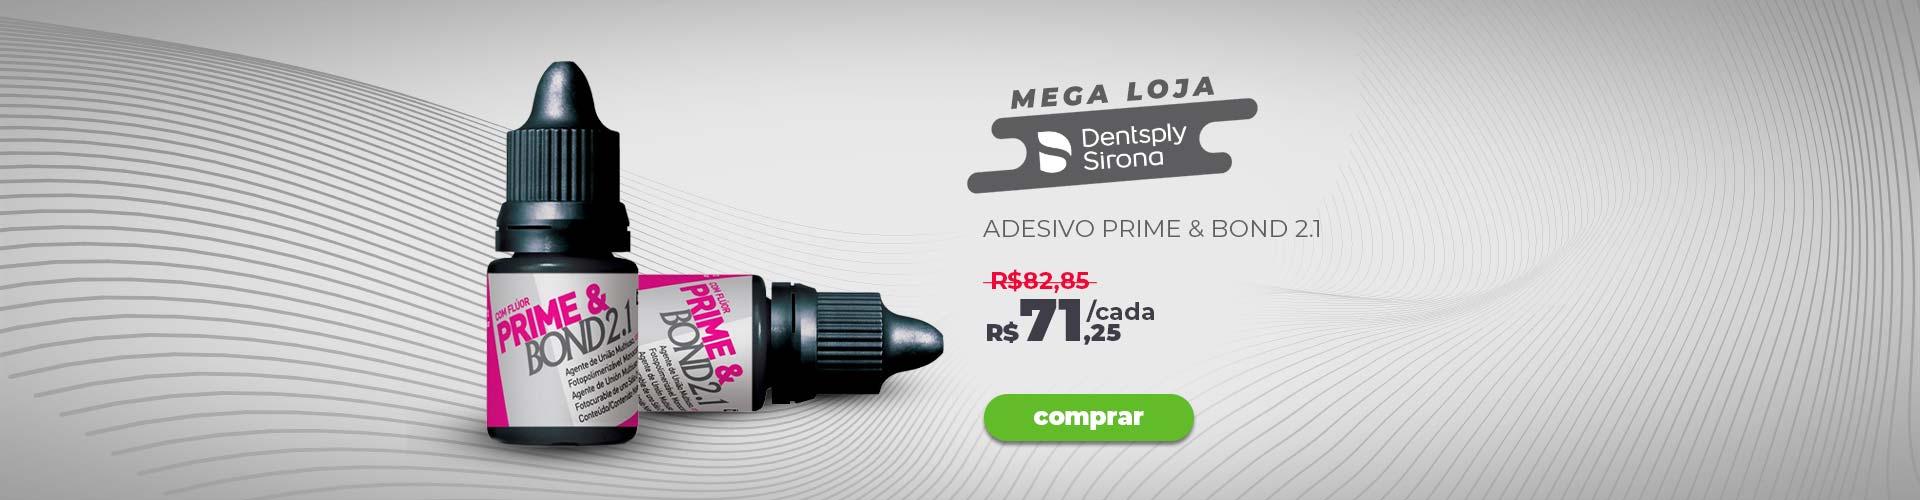 Banner Dentsply Mega Loja Prime Bond